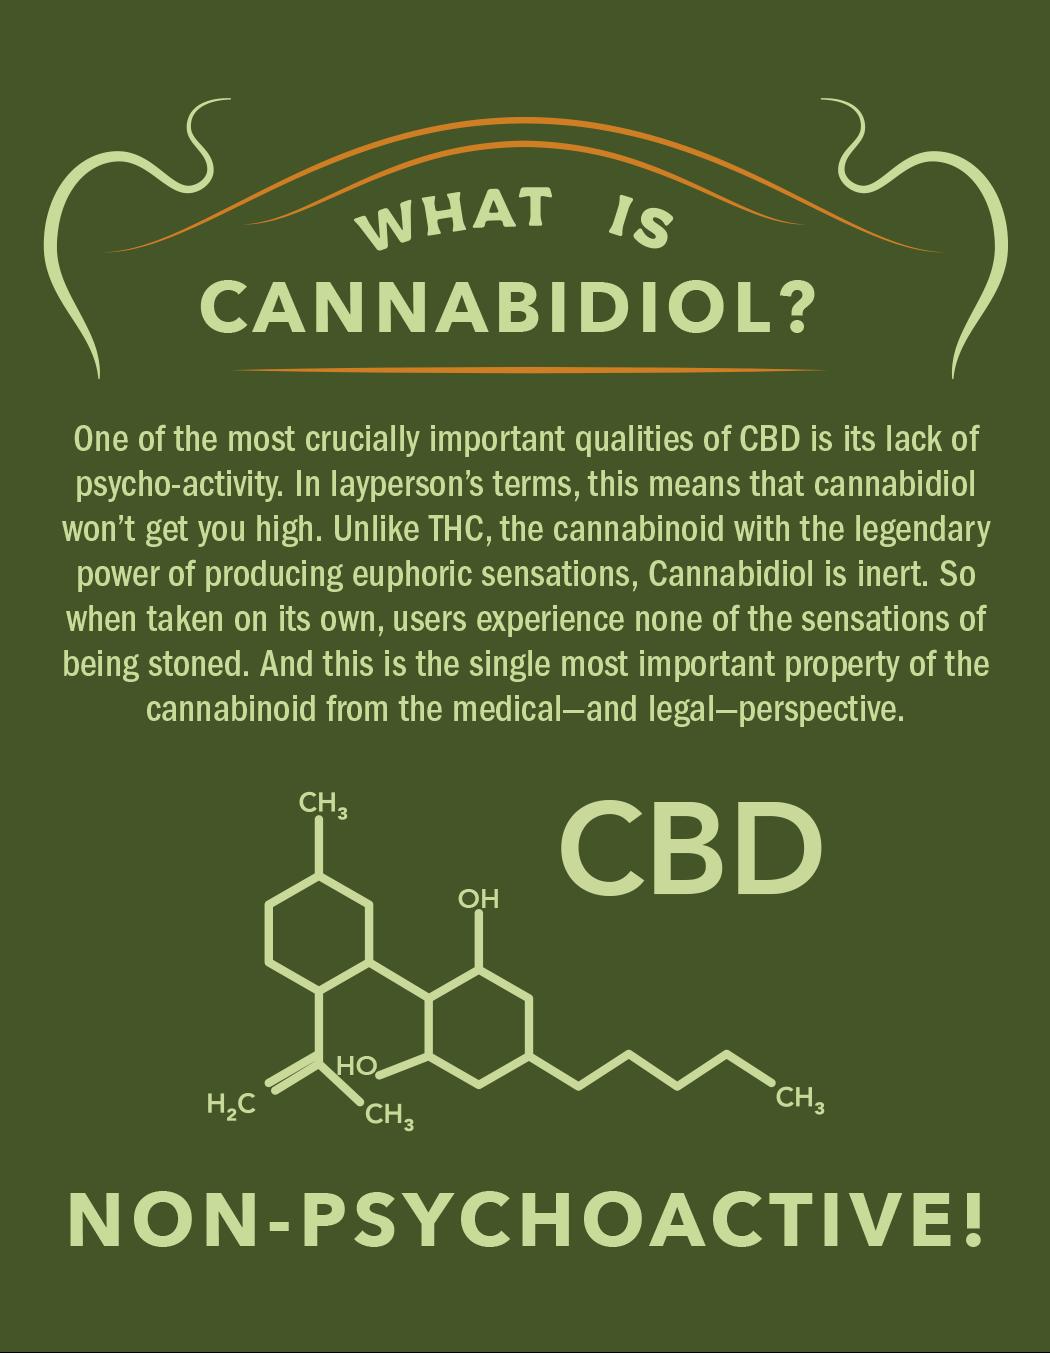 What is Cannabidiol?